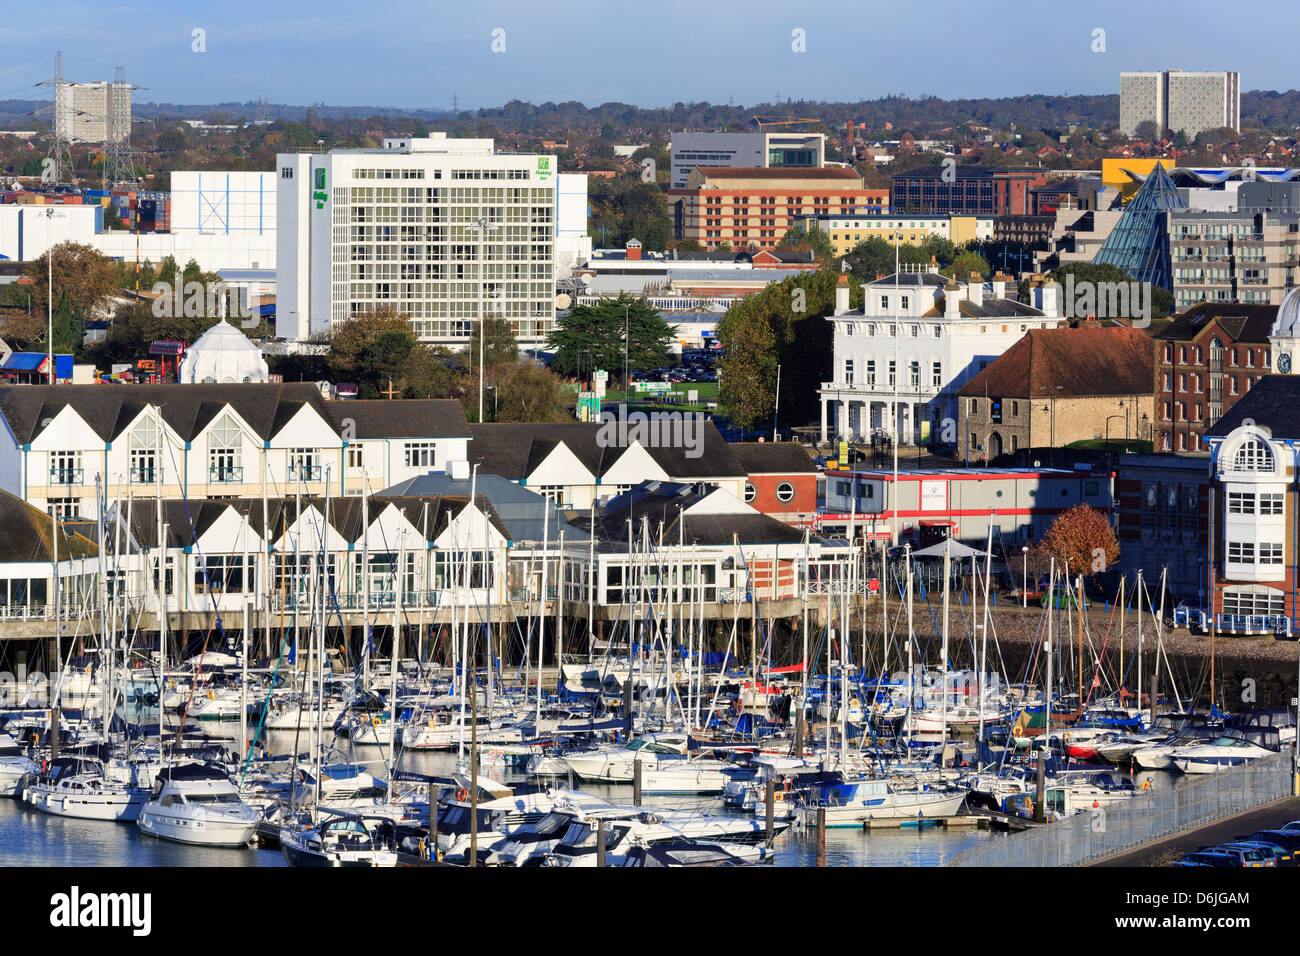 Town Quay and yacht marina, Southampton, Hampshire, England, United Kingdom, Europe Stock Photo